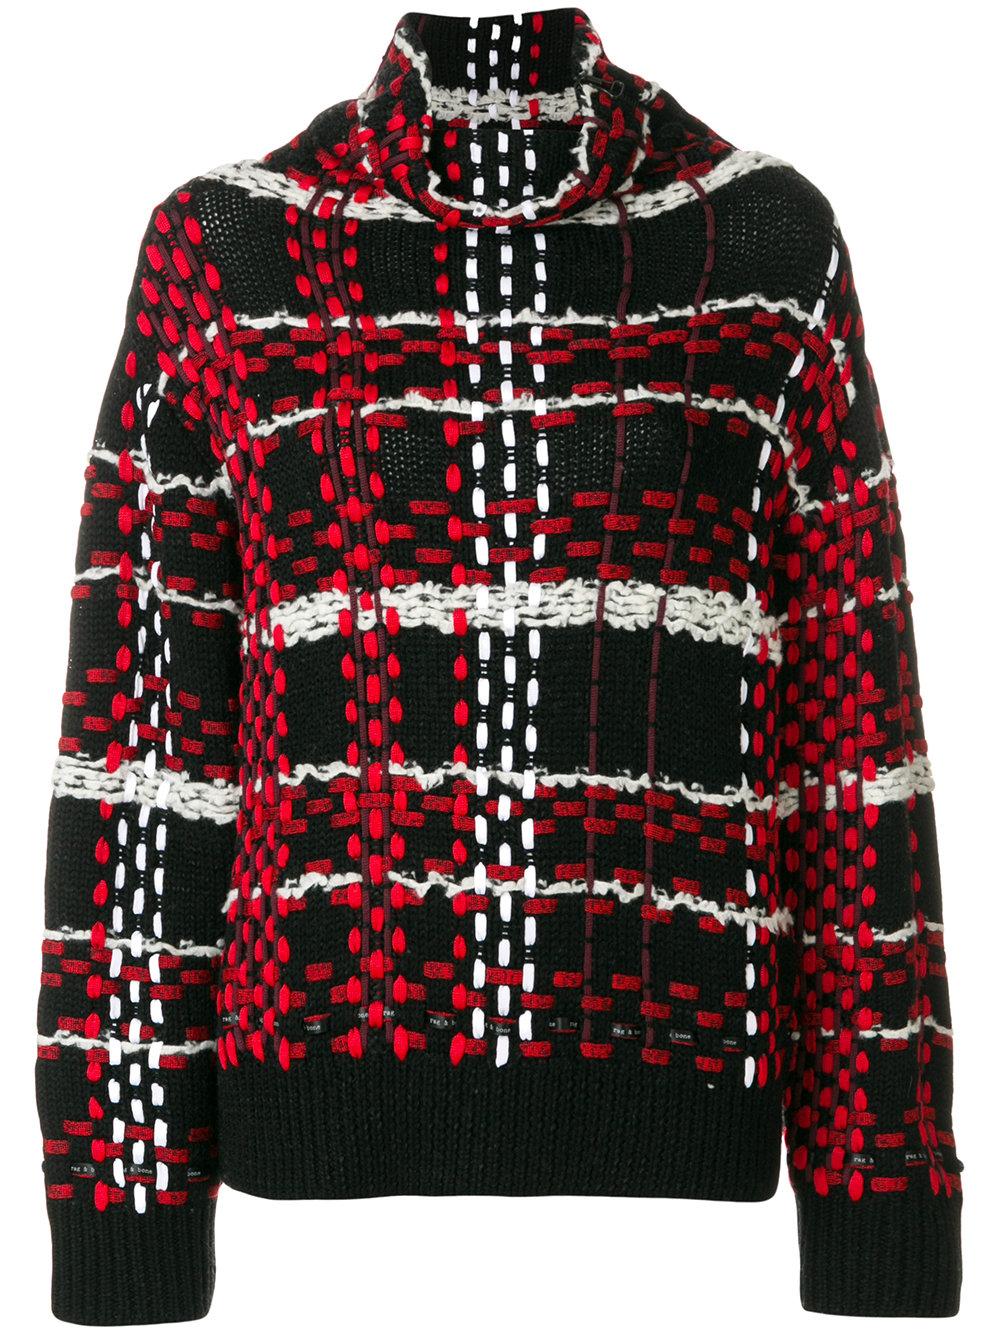 RAG & BONE jumper - $595